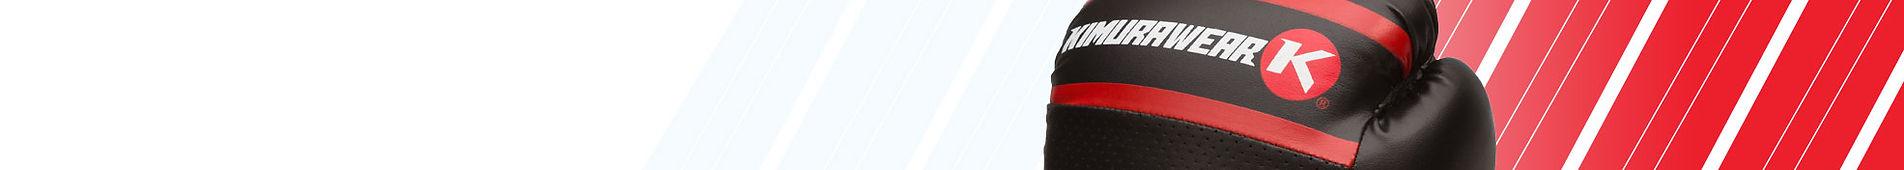 Aspire-Agari-Banner.jpg